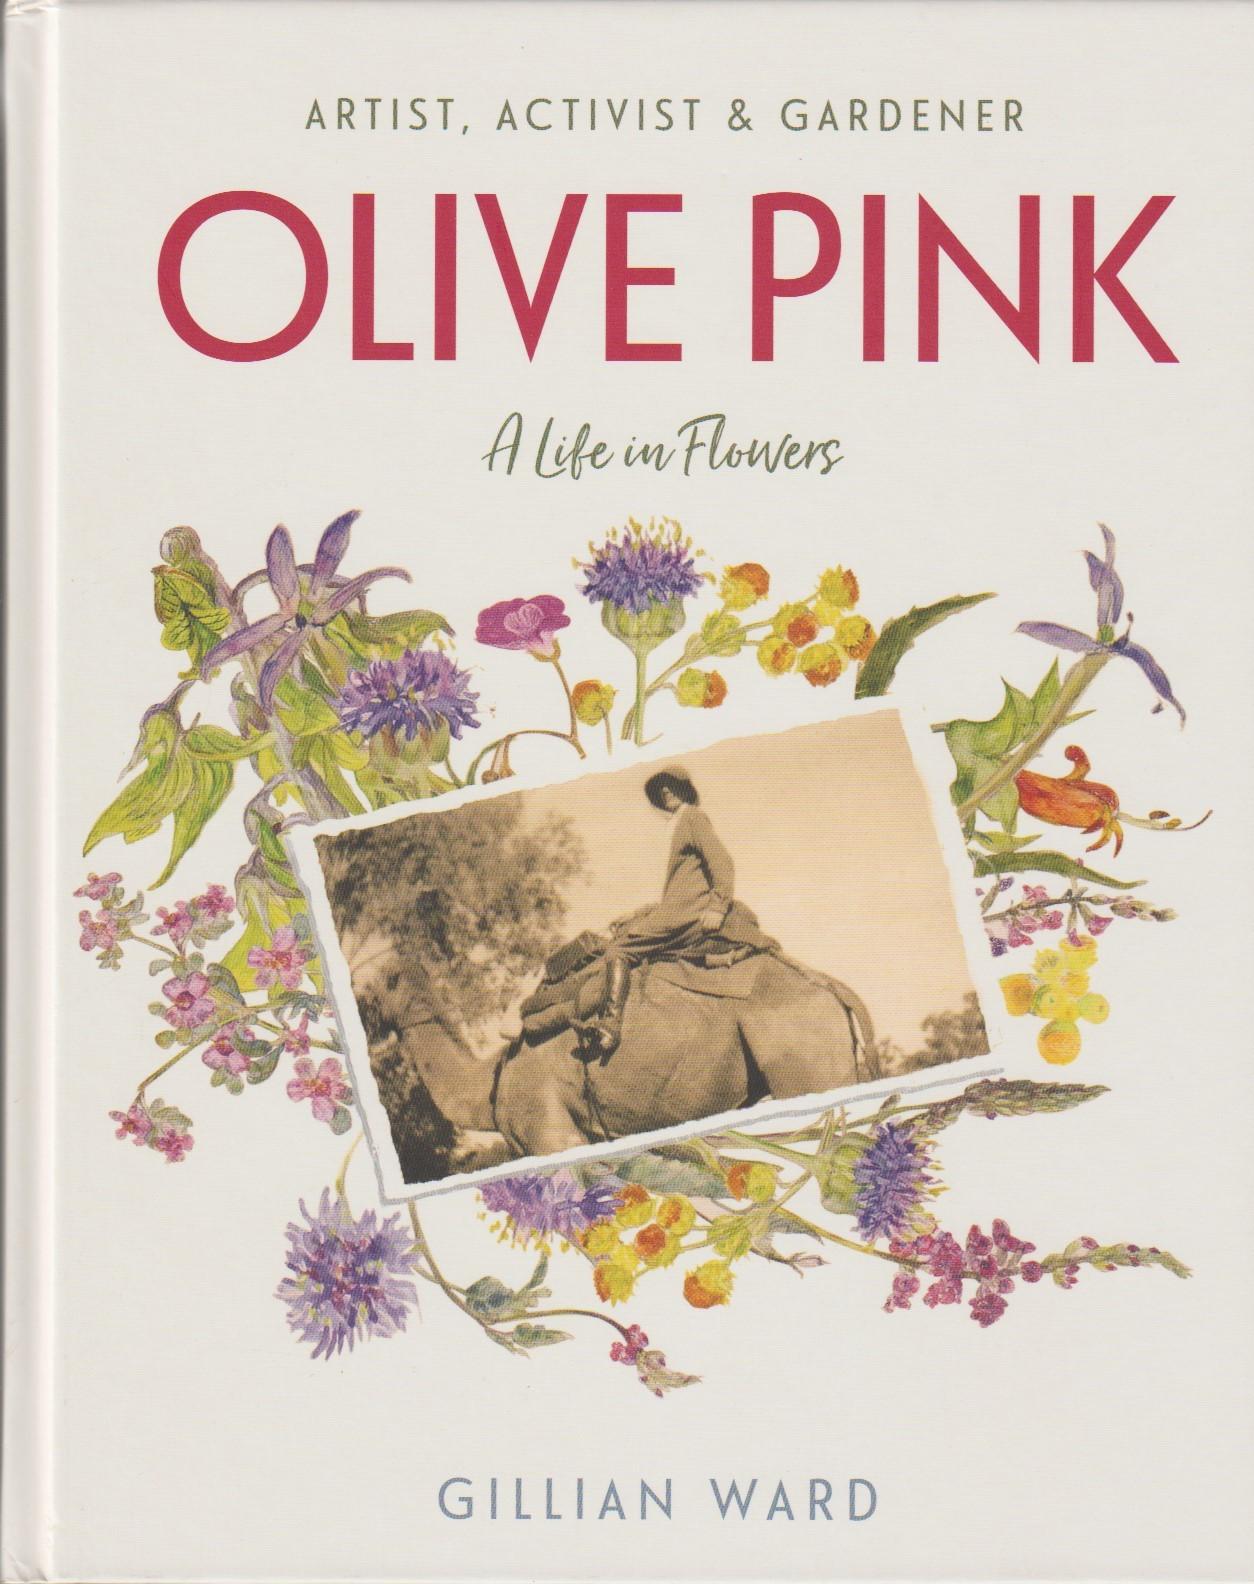 Olive Pink - Artist, Activist & Gardener - A life in flowers